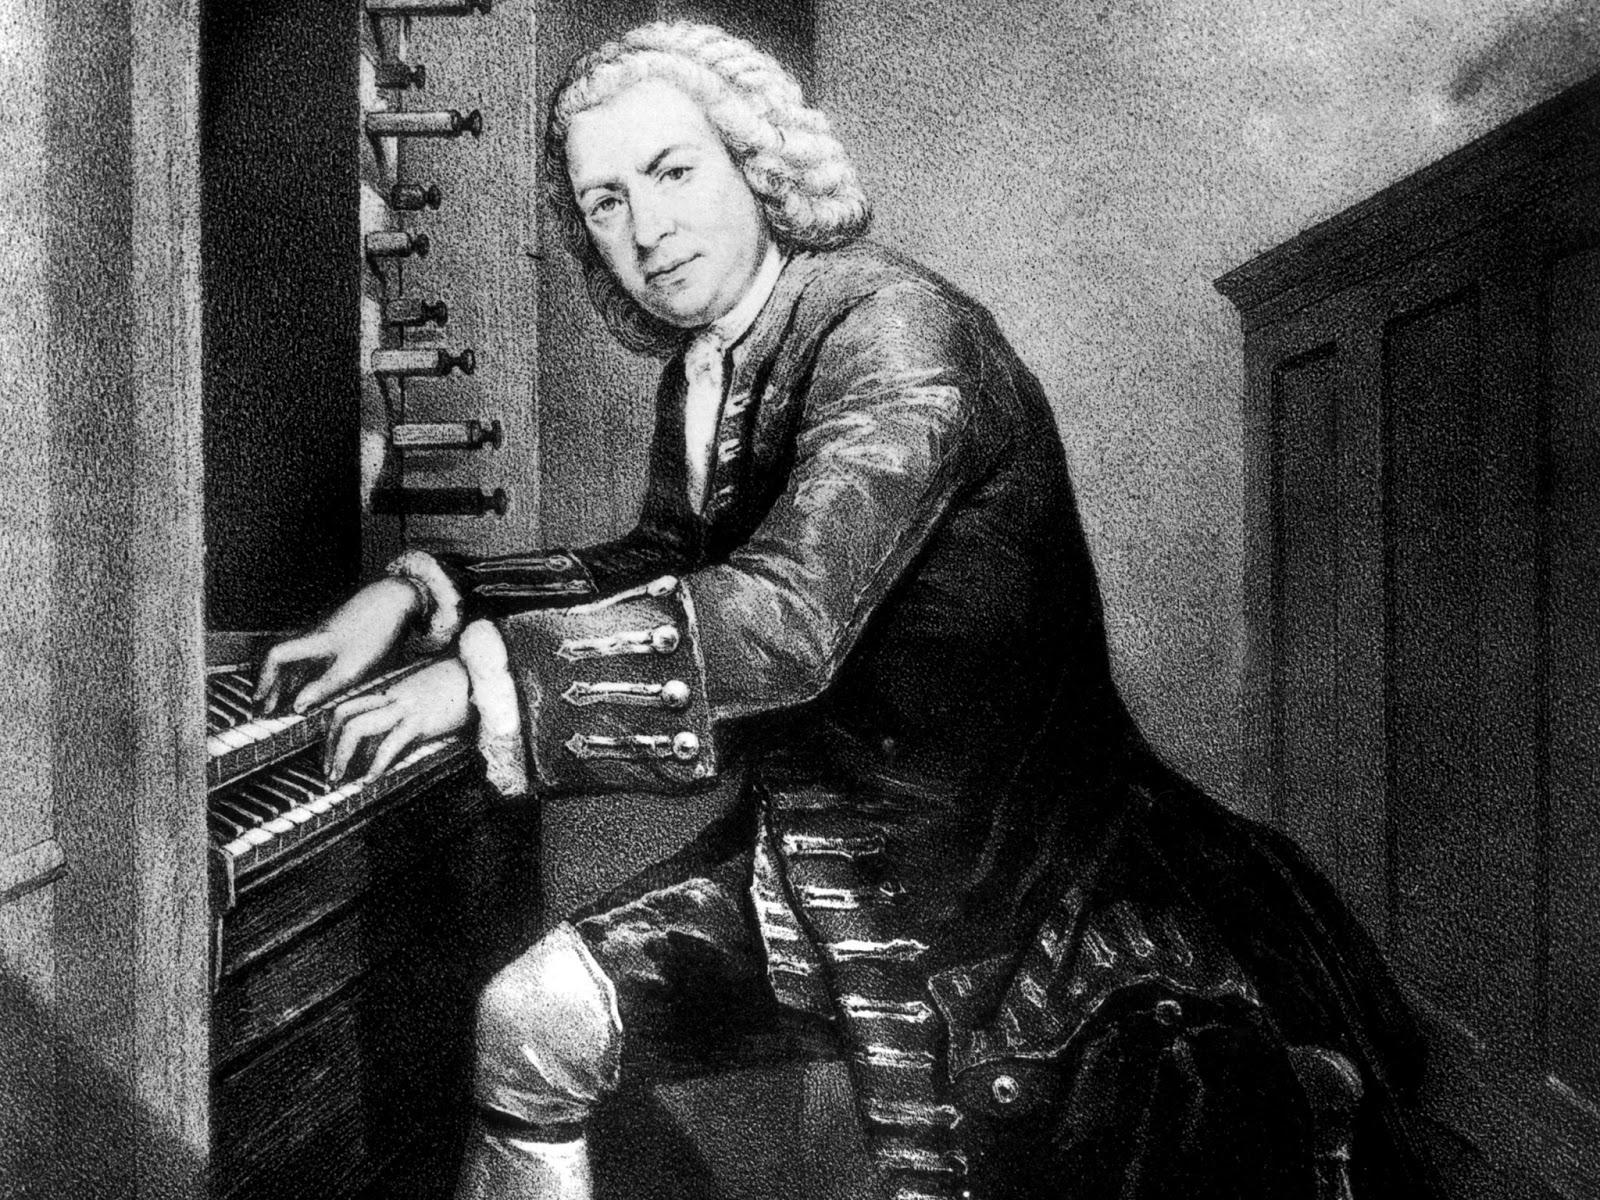 Johann-Sebastian Bach